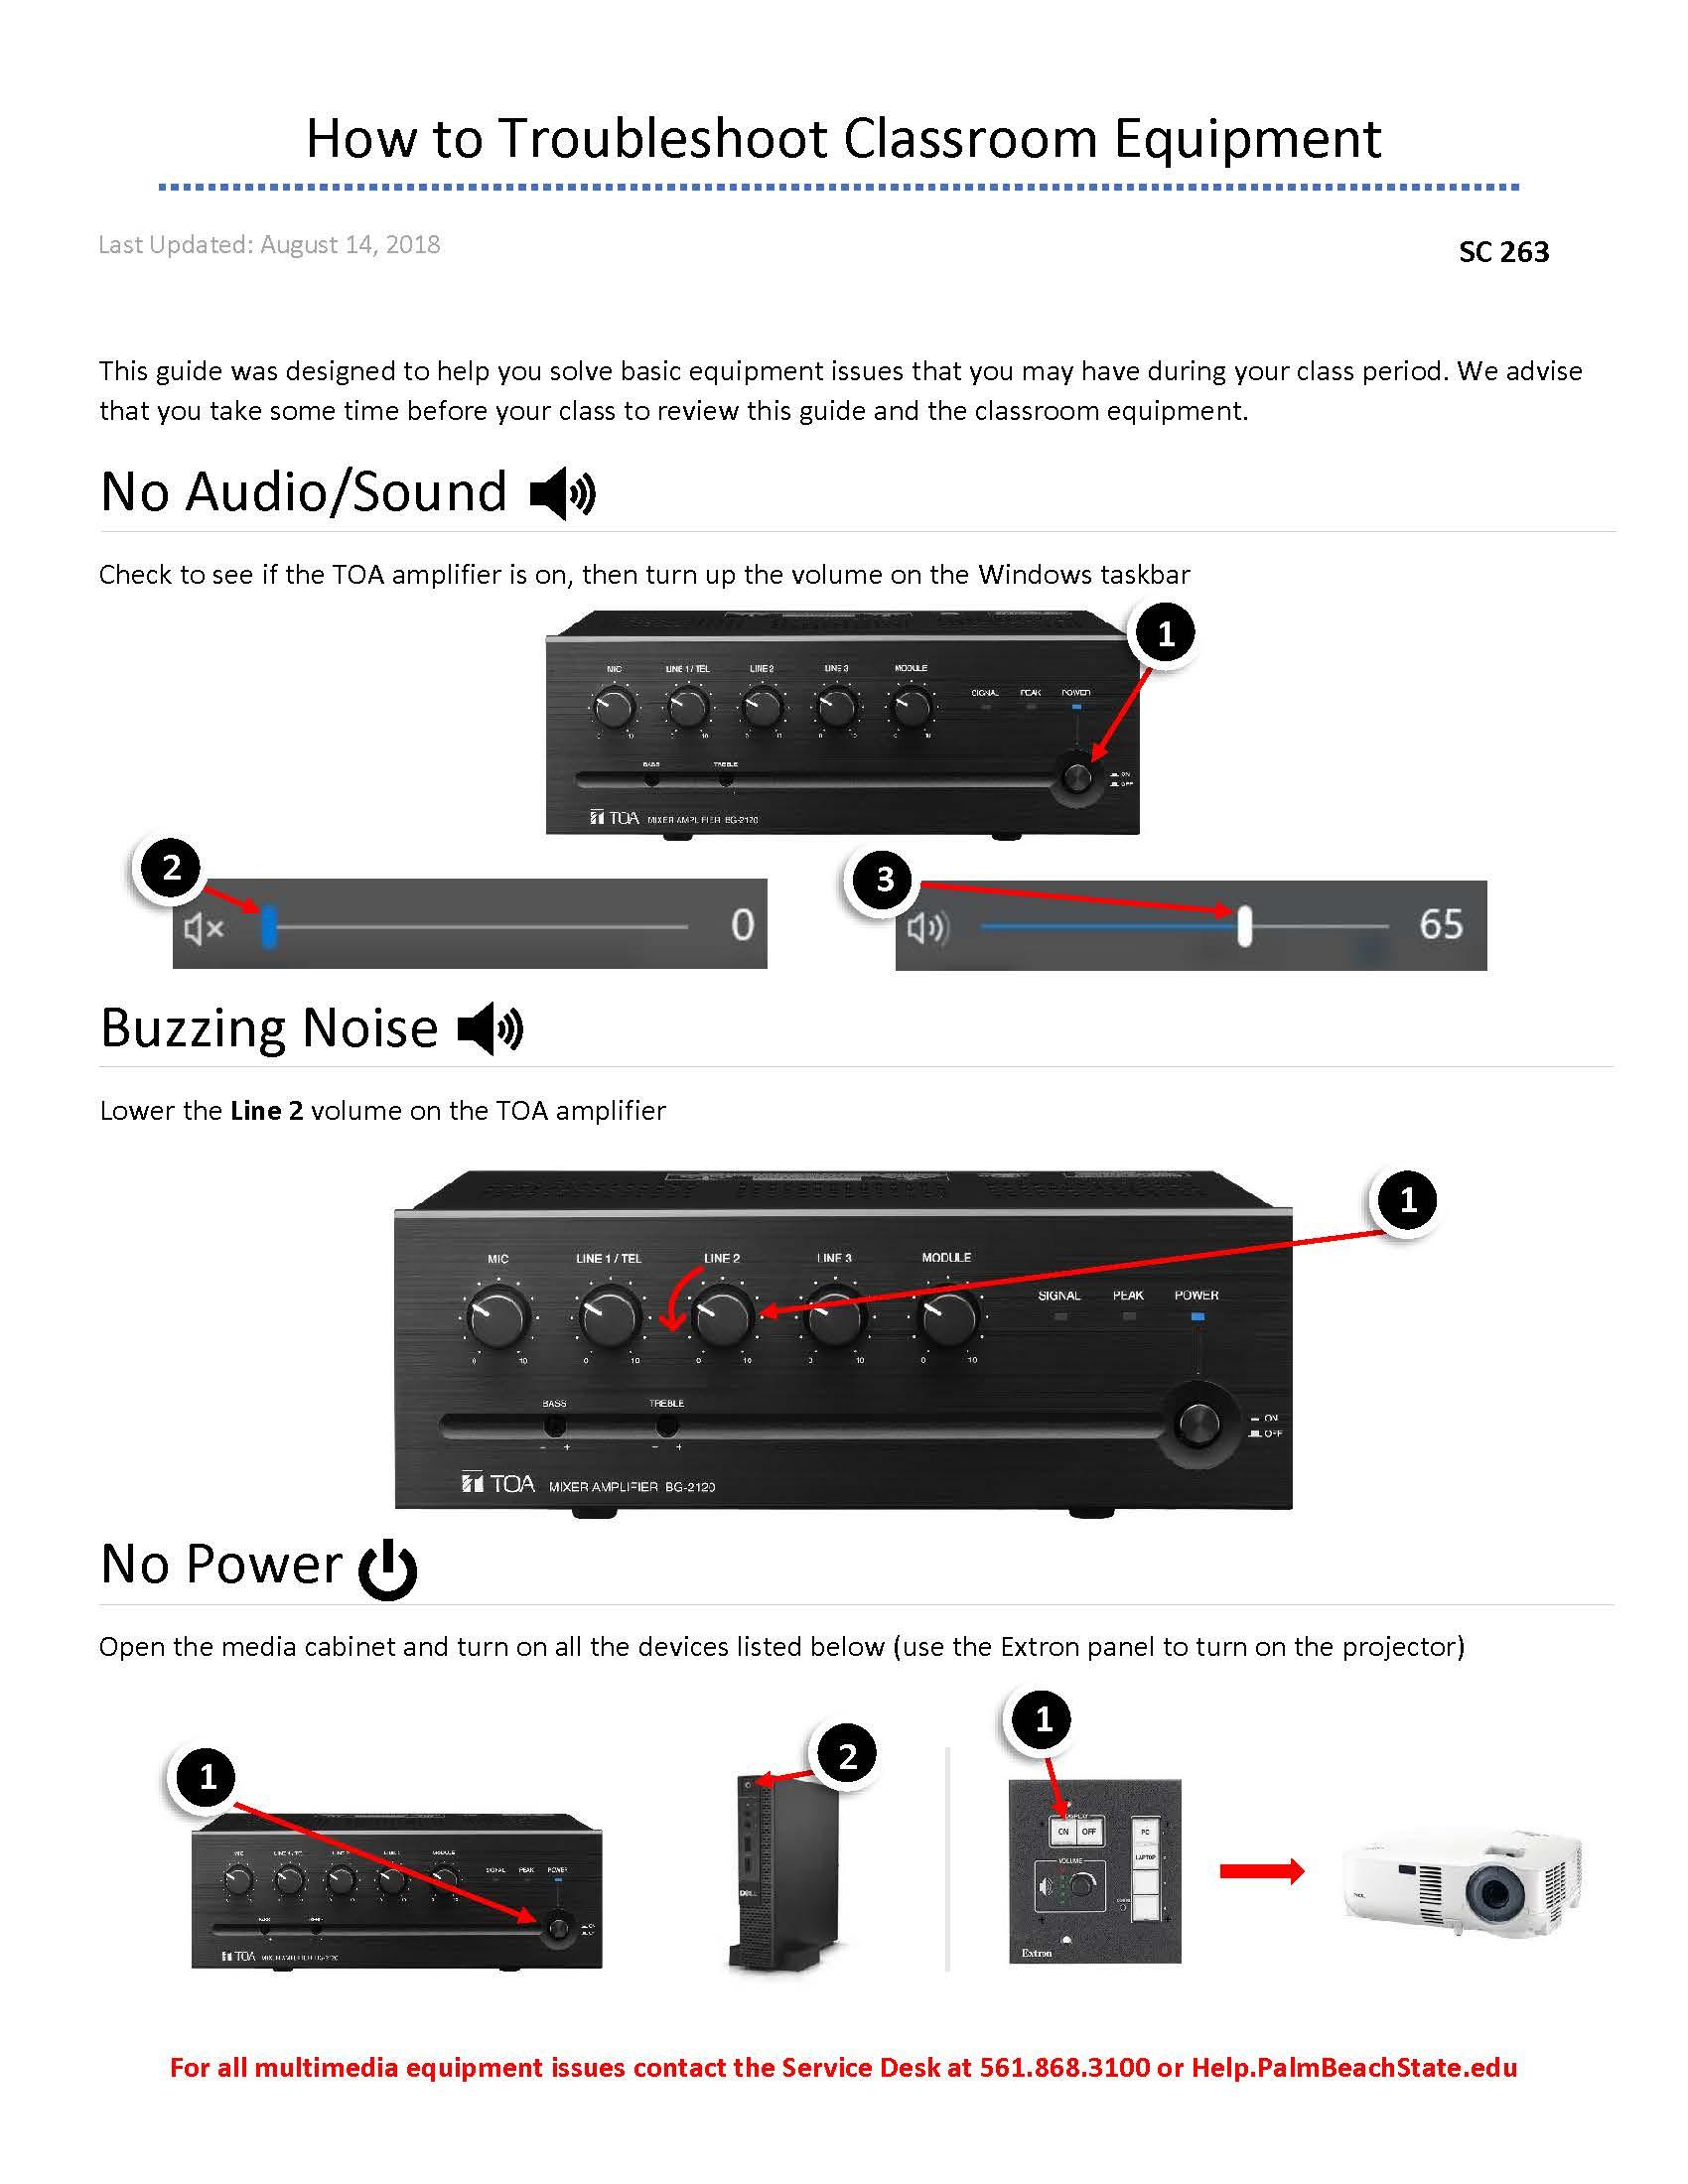 SC263 Multimedia Guide